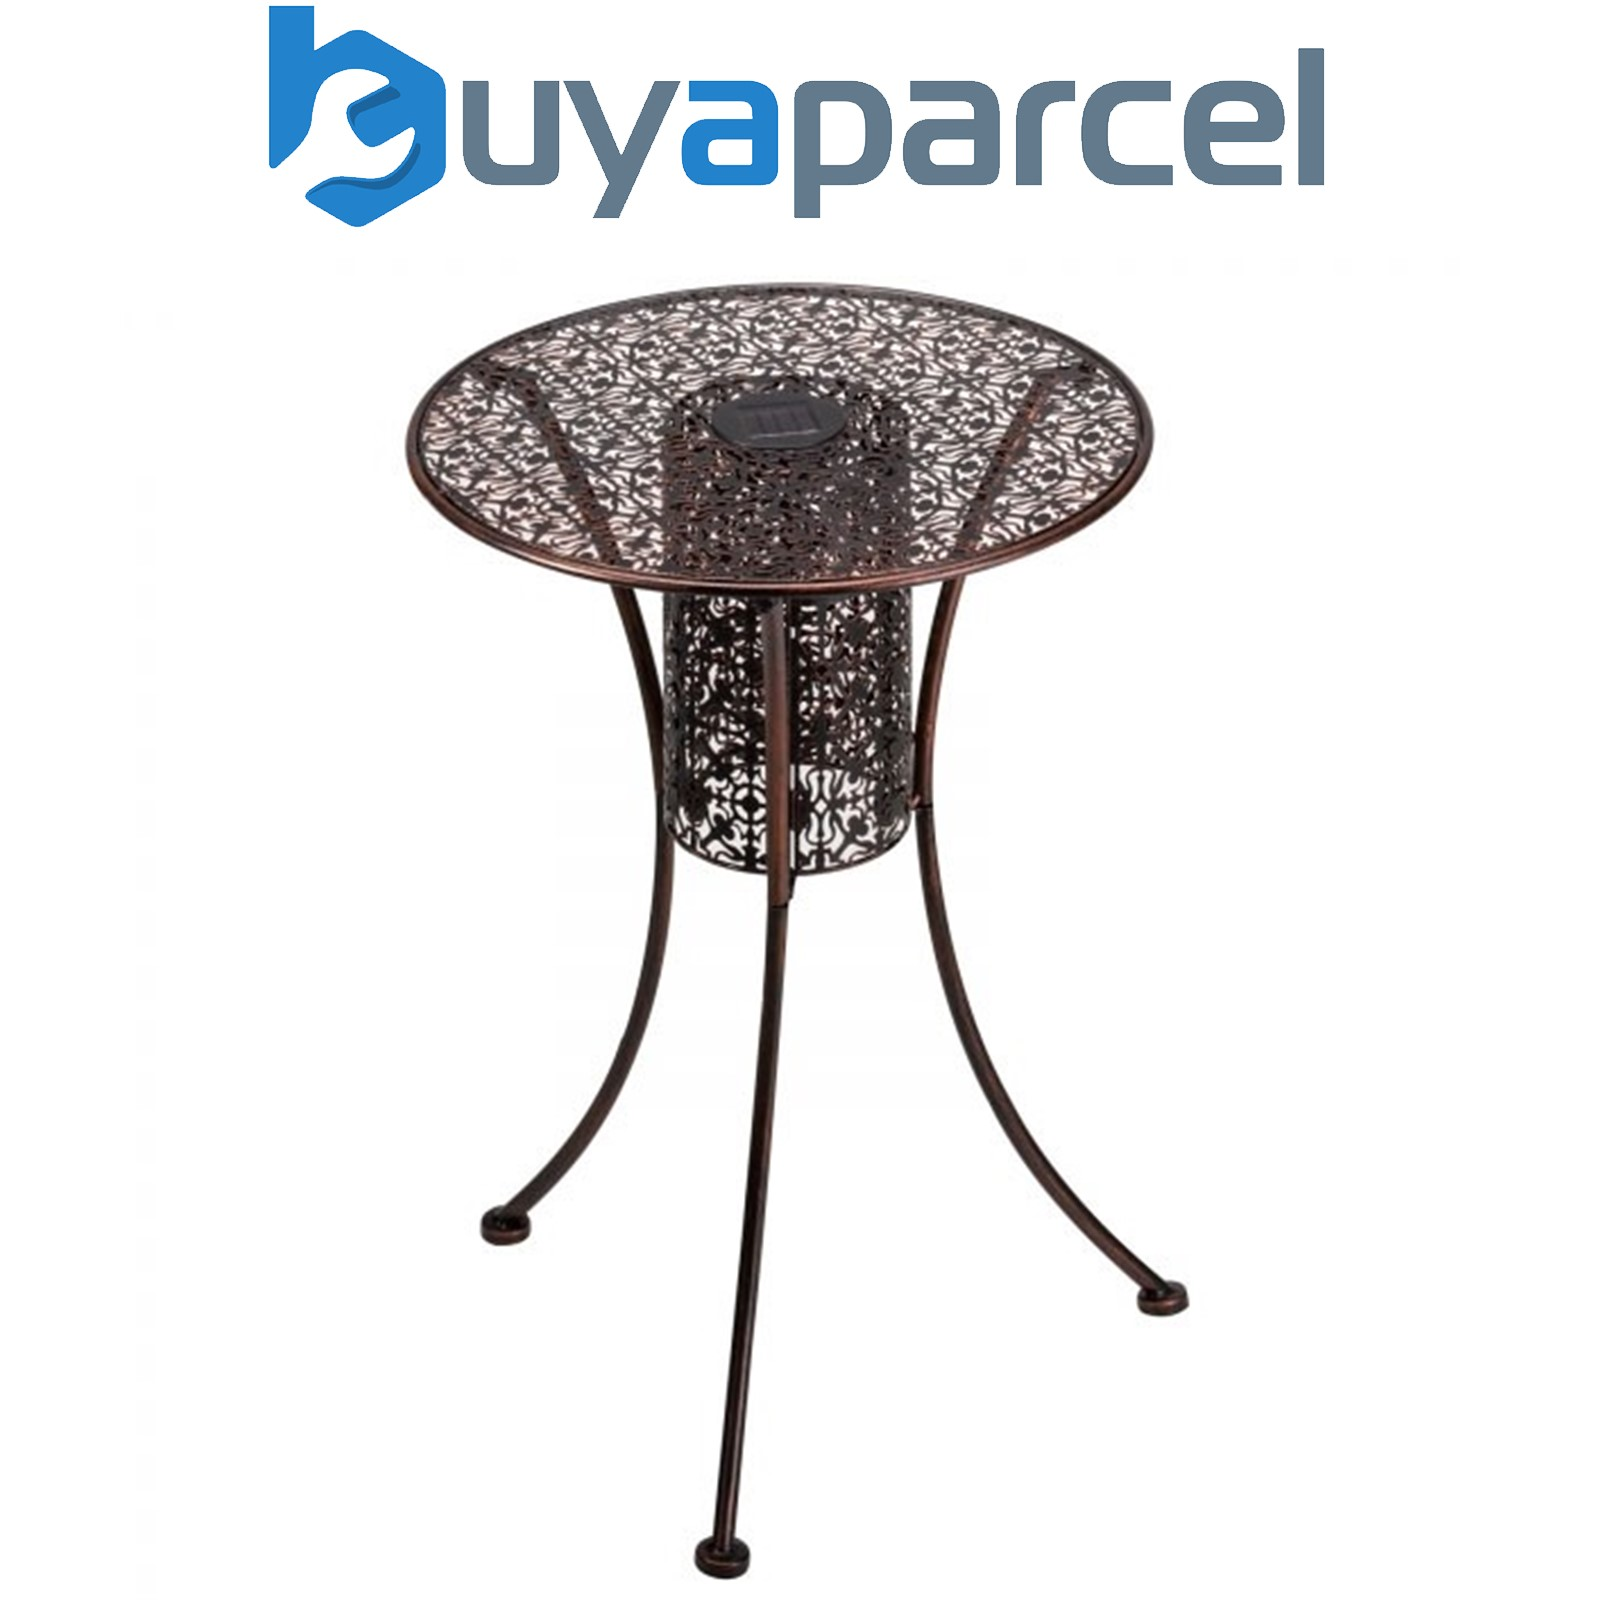 Patio Table Lights Uk: Smart Garden Solar Illumina Silhouette Patio Bistro Table